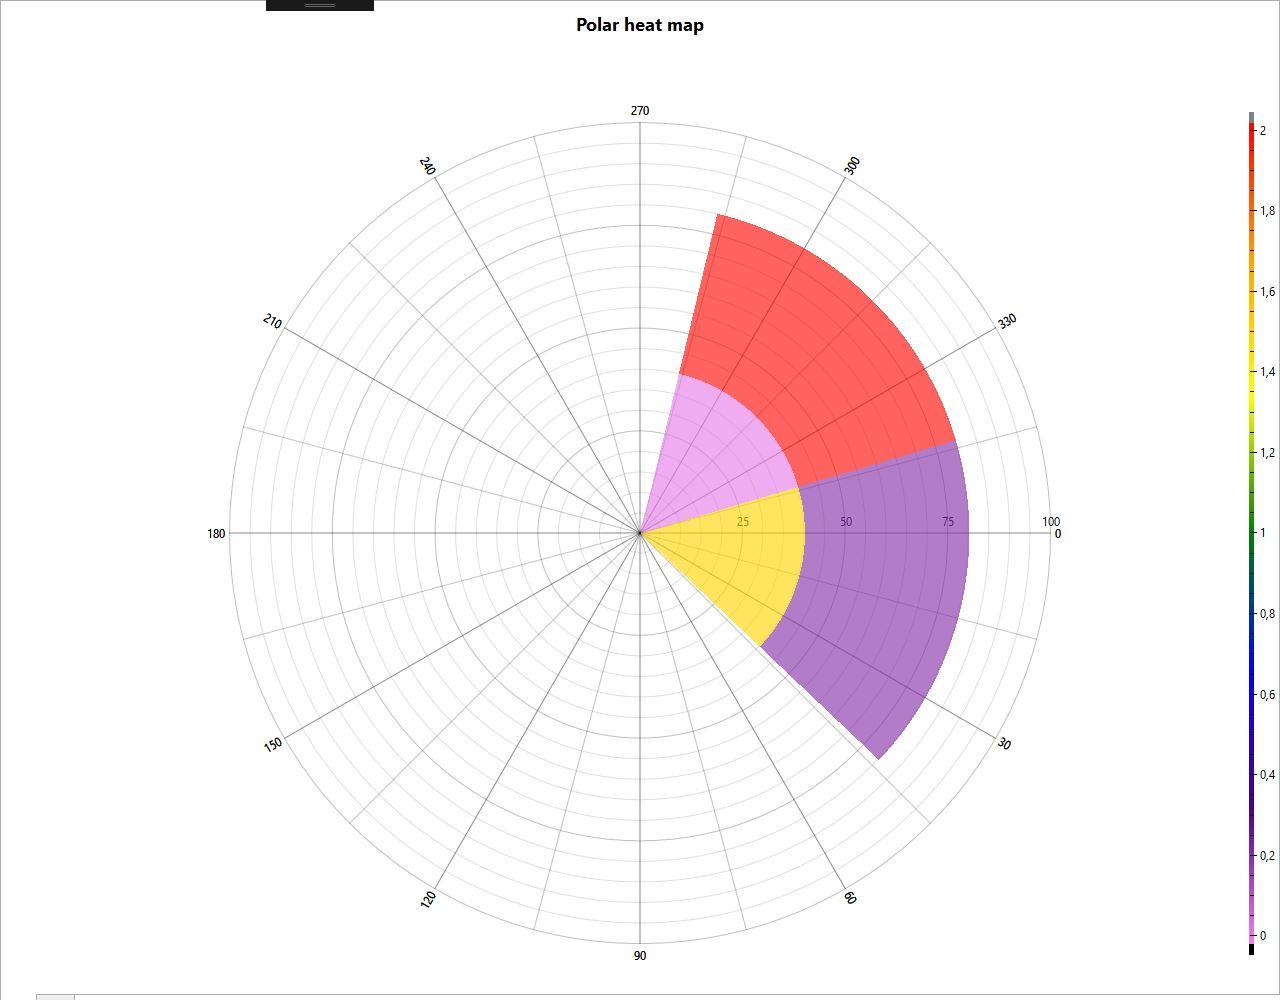 Polar Plot Angleaxis Startangle Endangle Degrees Radians